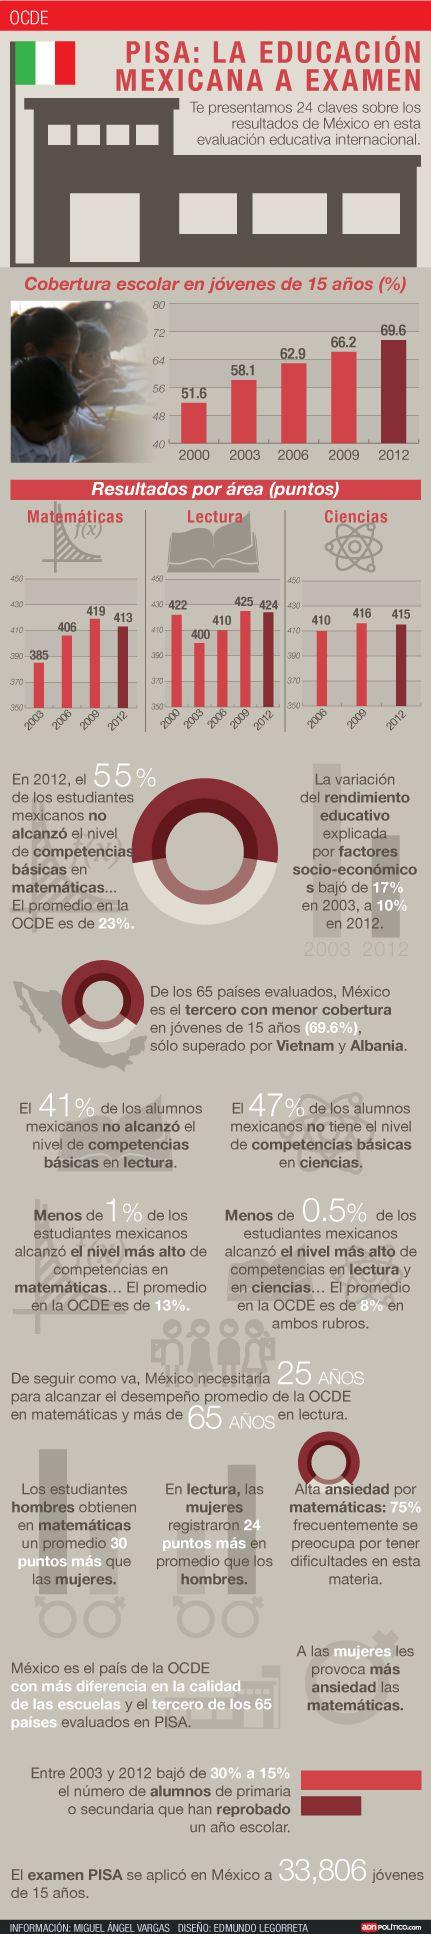 El informe PISA 2013 en México #infografia #infographic #education